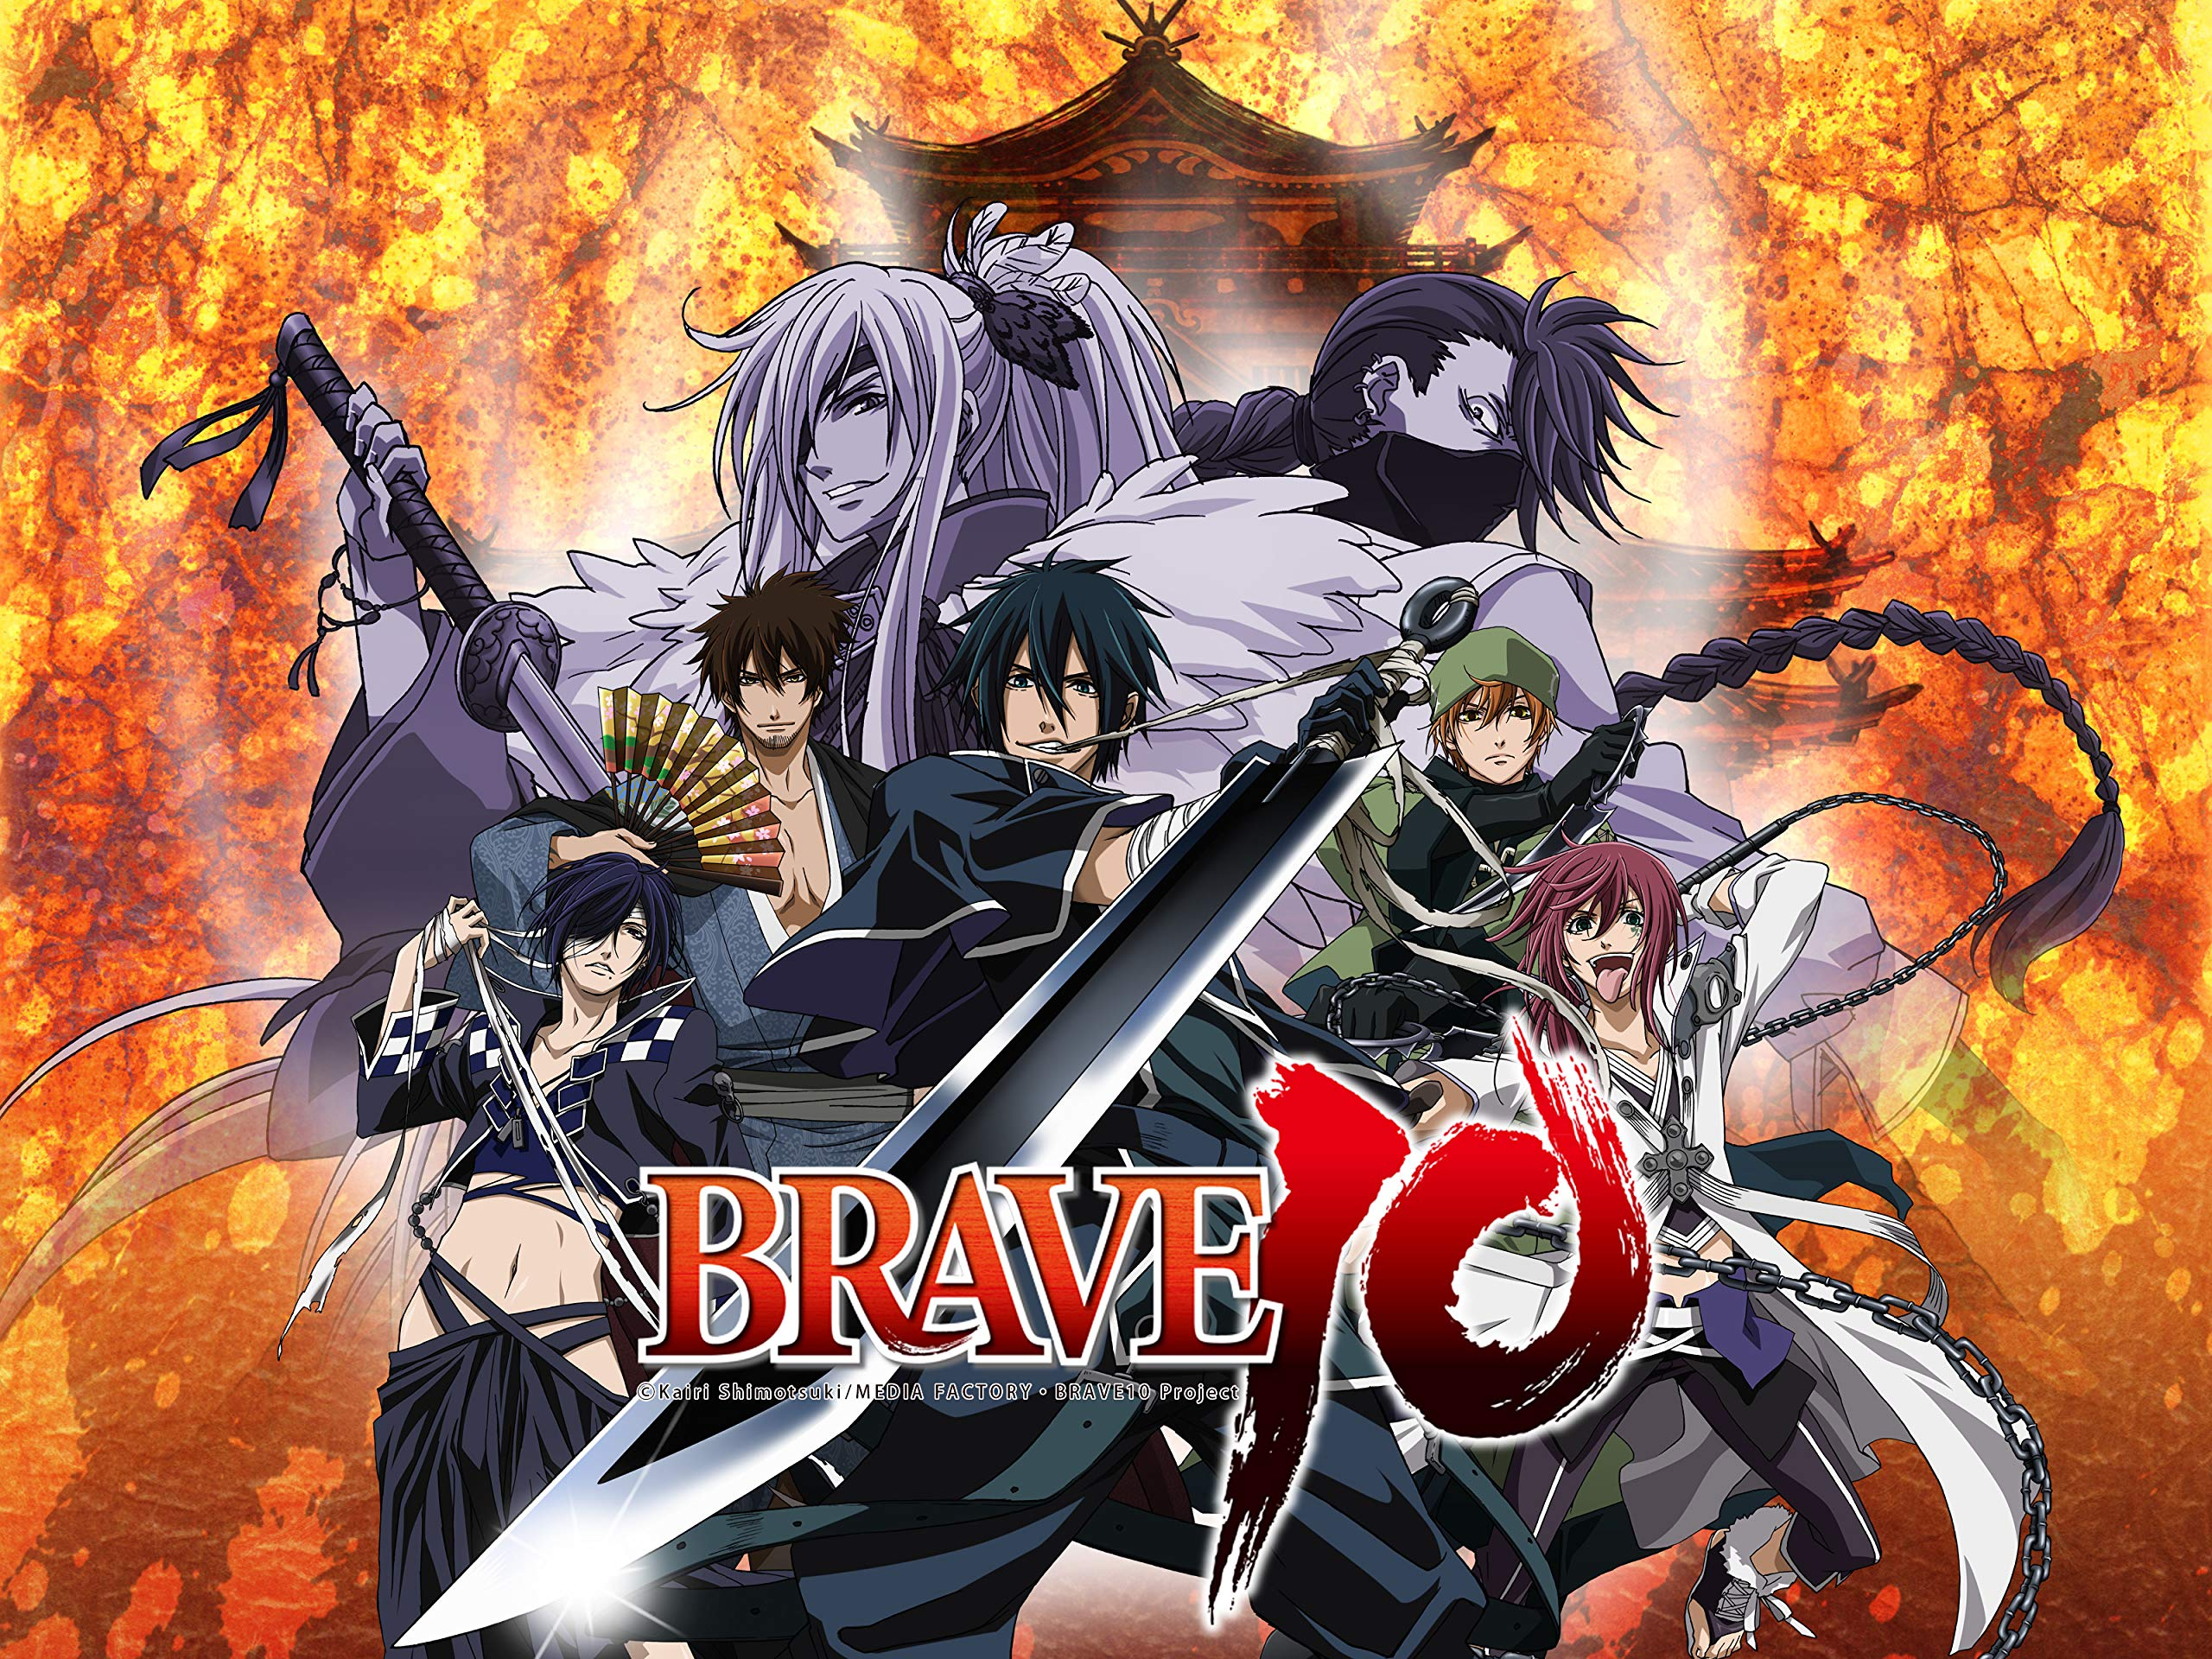 Brave 10 anime dengan tema ninja